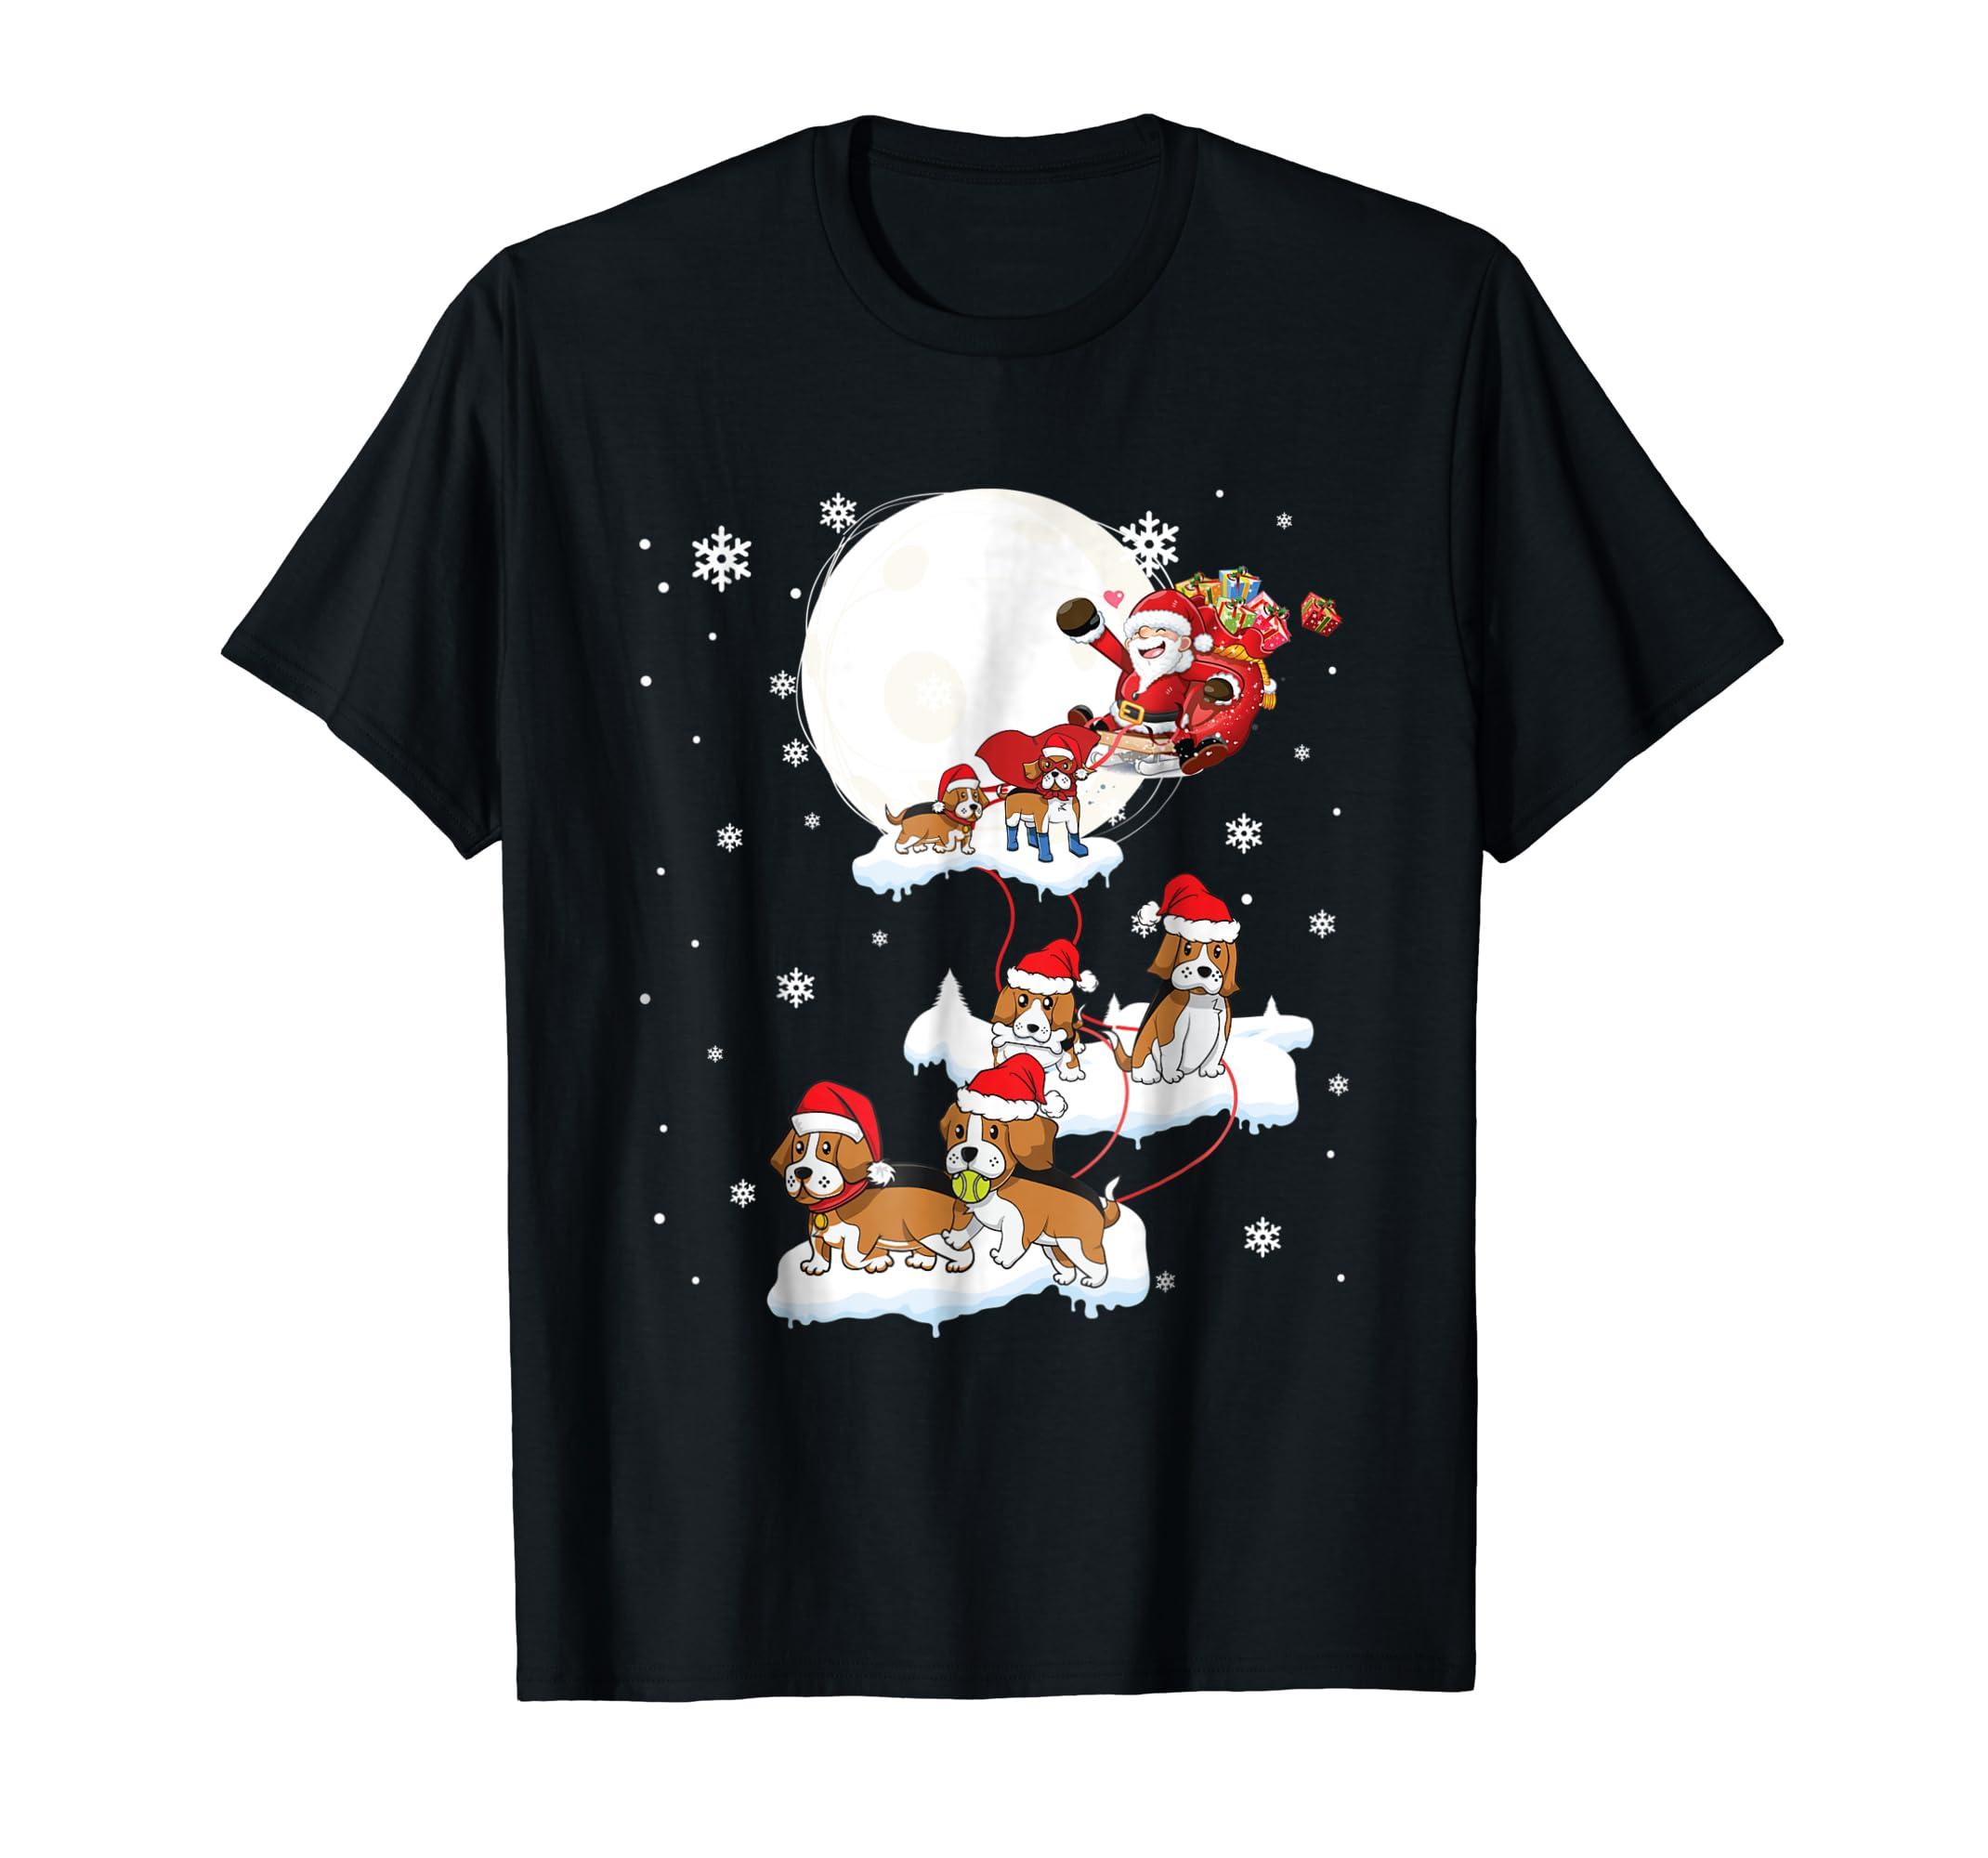 Santa Claus Riding Beagle Dogs Christmas Tshirt Xmas Gifts-Men's T-Shirt-Black